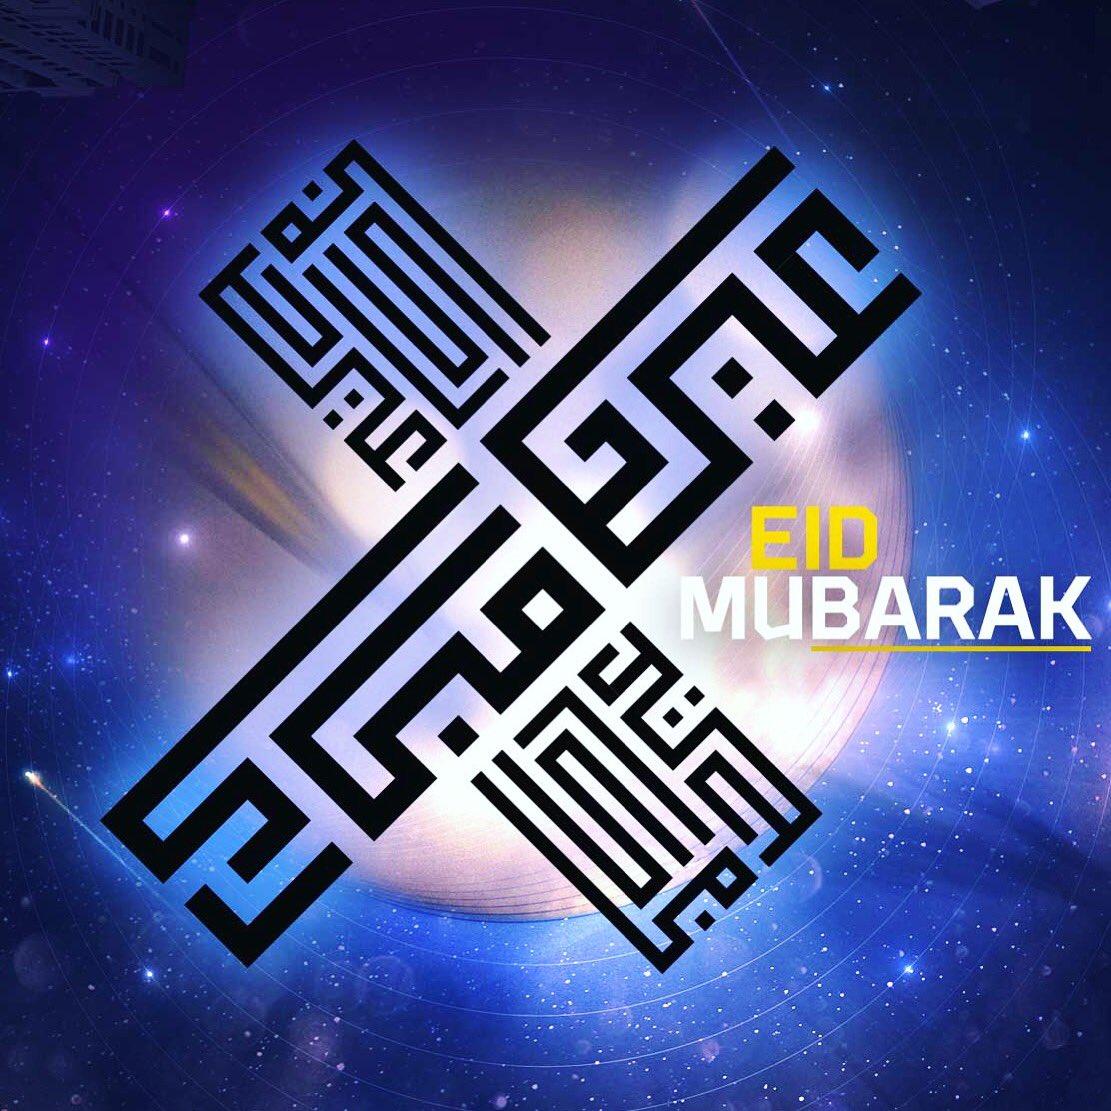 The #XDubai family wishes you all a blessed #Eid Al Fitr. #EidMubarak https://t.co/jaMsVI9Xcn